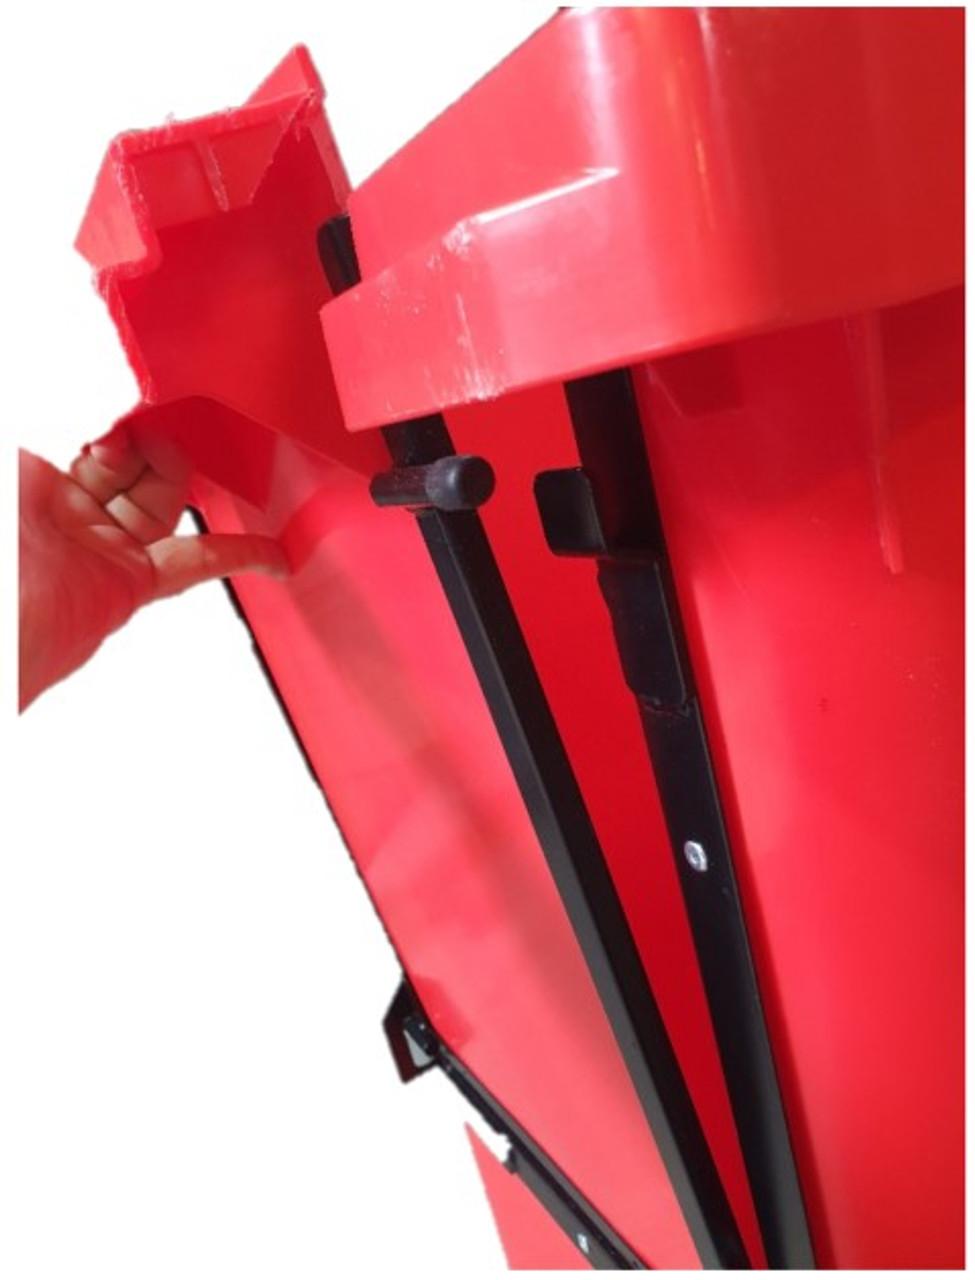 Wheelie Bin With Drop Front - Close Up